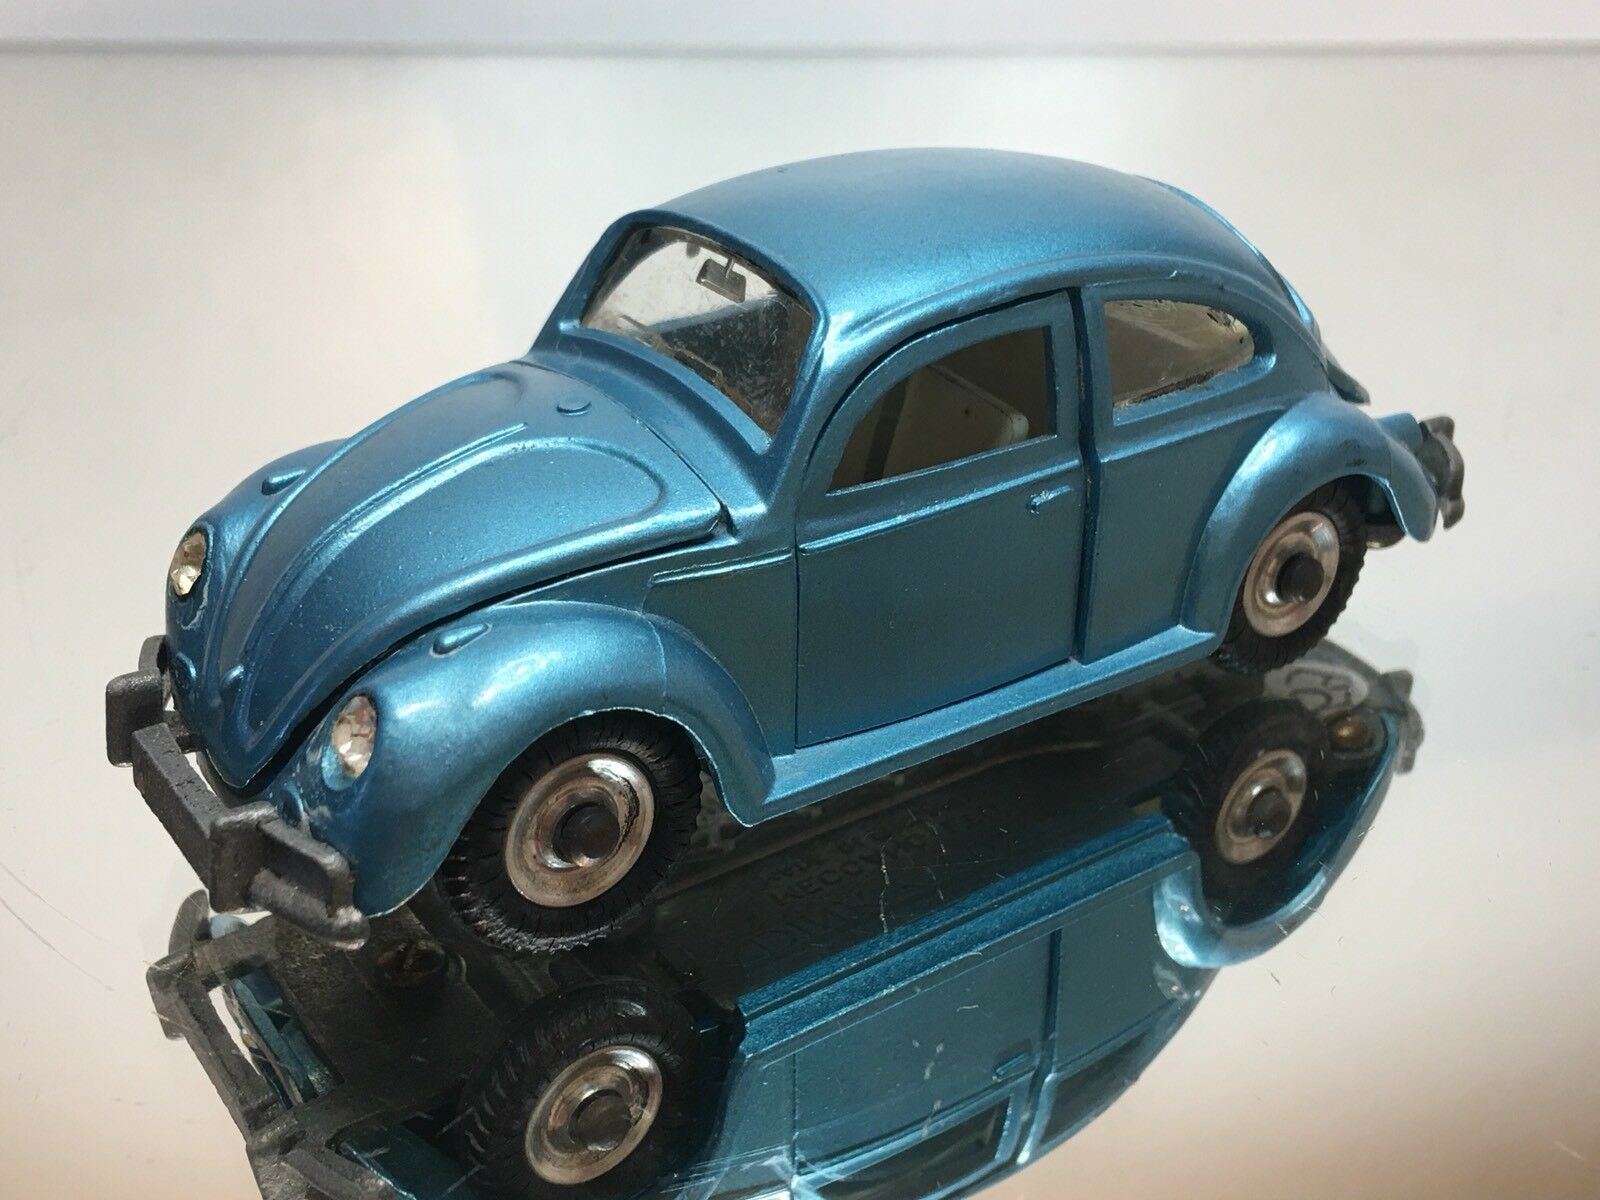 alta calidad general DINKY TOYS 129 VW VOLKSWAGEN BEETLE 1300 - azul azul azul 1 43 - GOOD CONDITION  bienvenido a orden